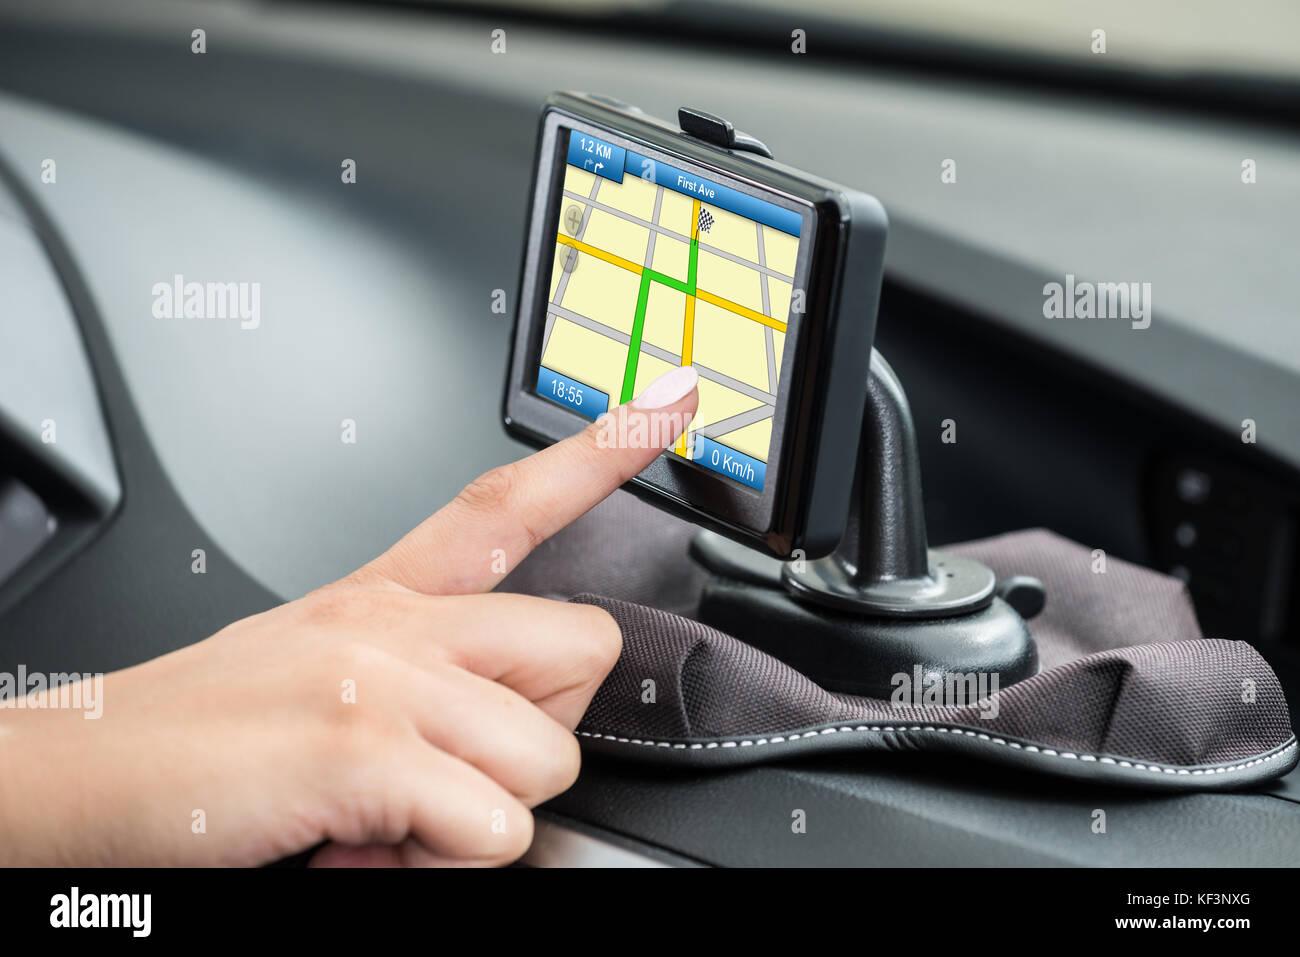 Close-up Of Female's Hand Using GPS Navigation Inside Car - Stock Image